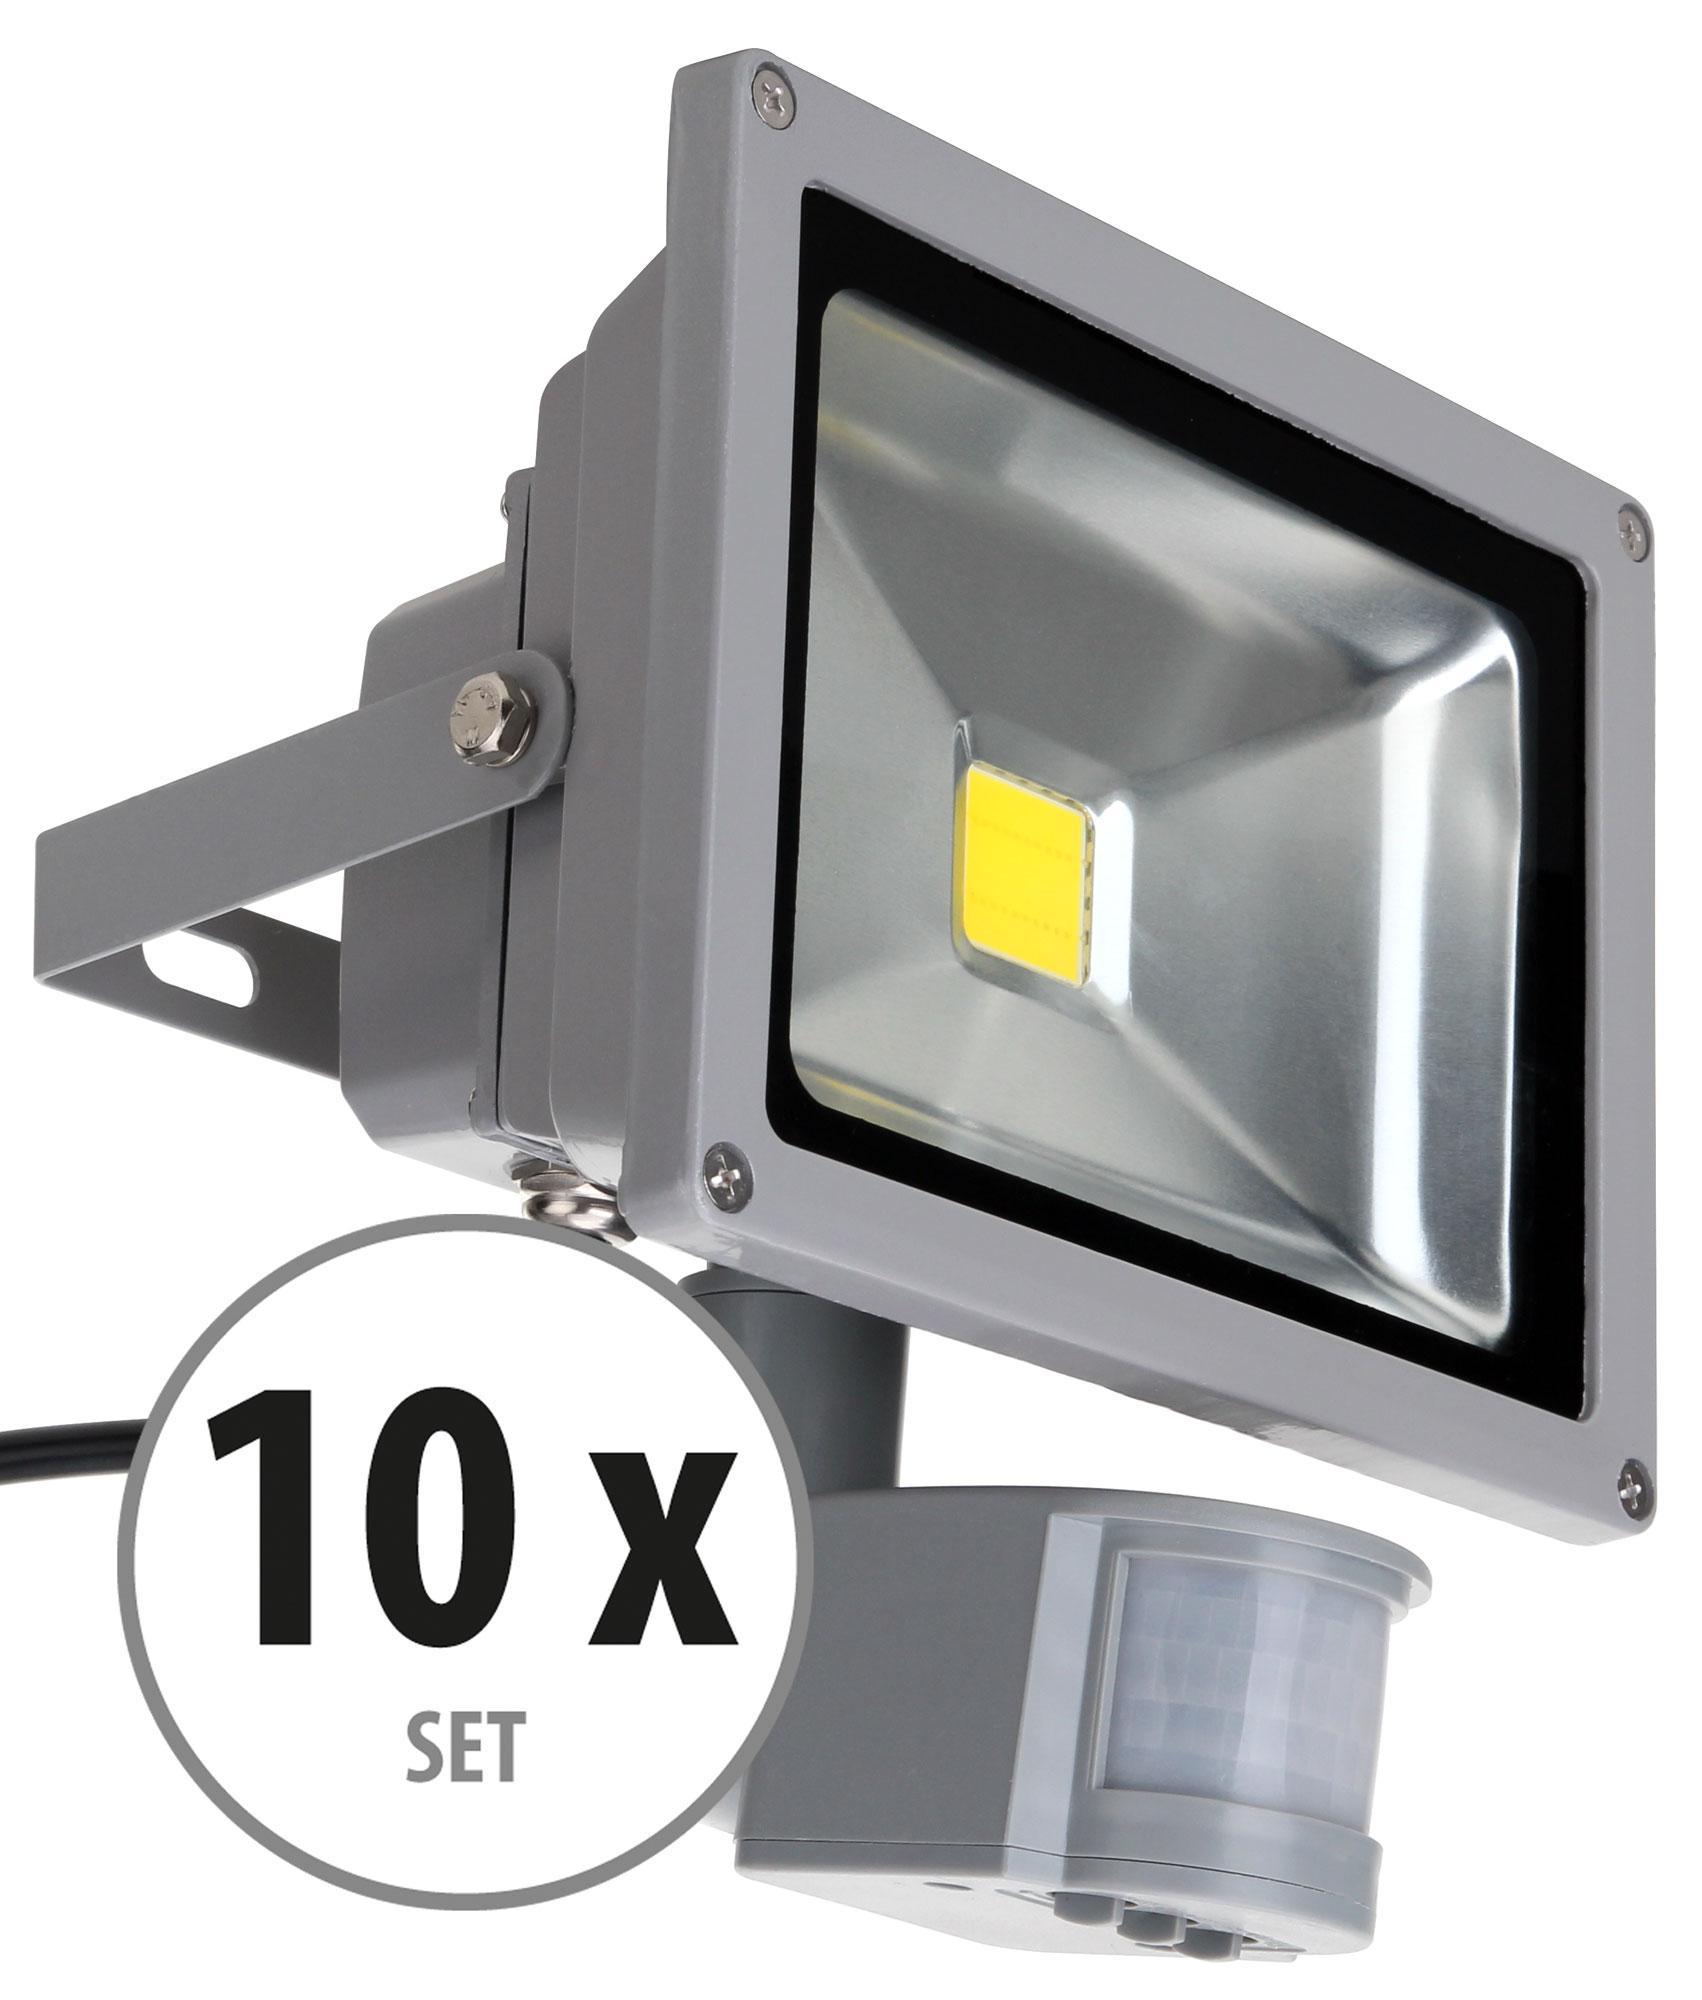 Showlite Fl 2020b Led Floodlight Ip65 20w 2200 Lumens Motion Flood Light Lamp High Power Black Case With 1m Cable Wire Detector 10 Piece Set